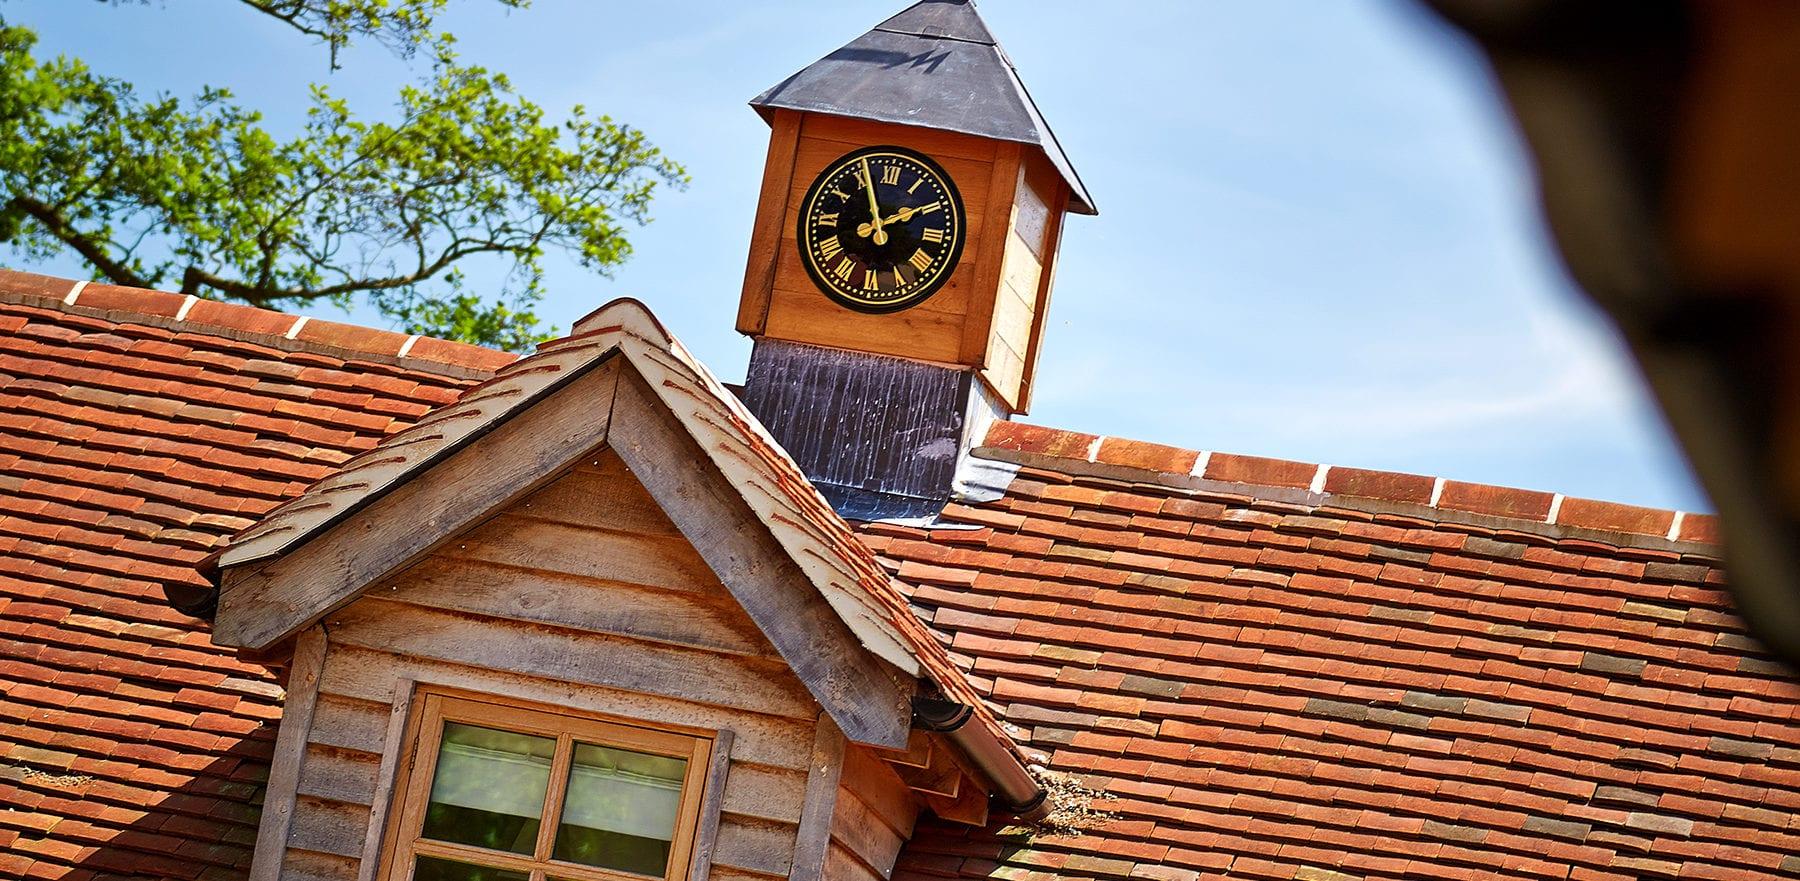 Lifestiles - Handmade Bespoke Clay Roof Tiles - Ascot, England 6